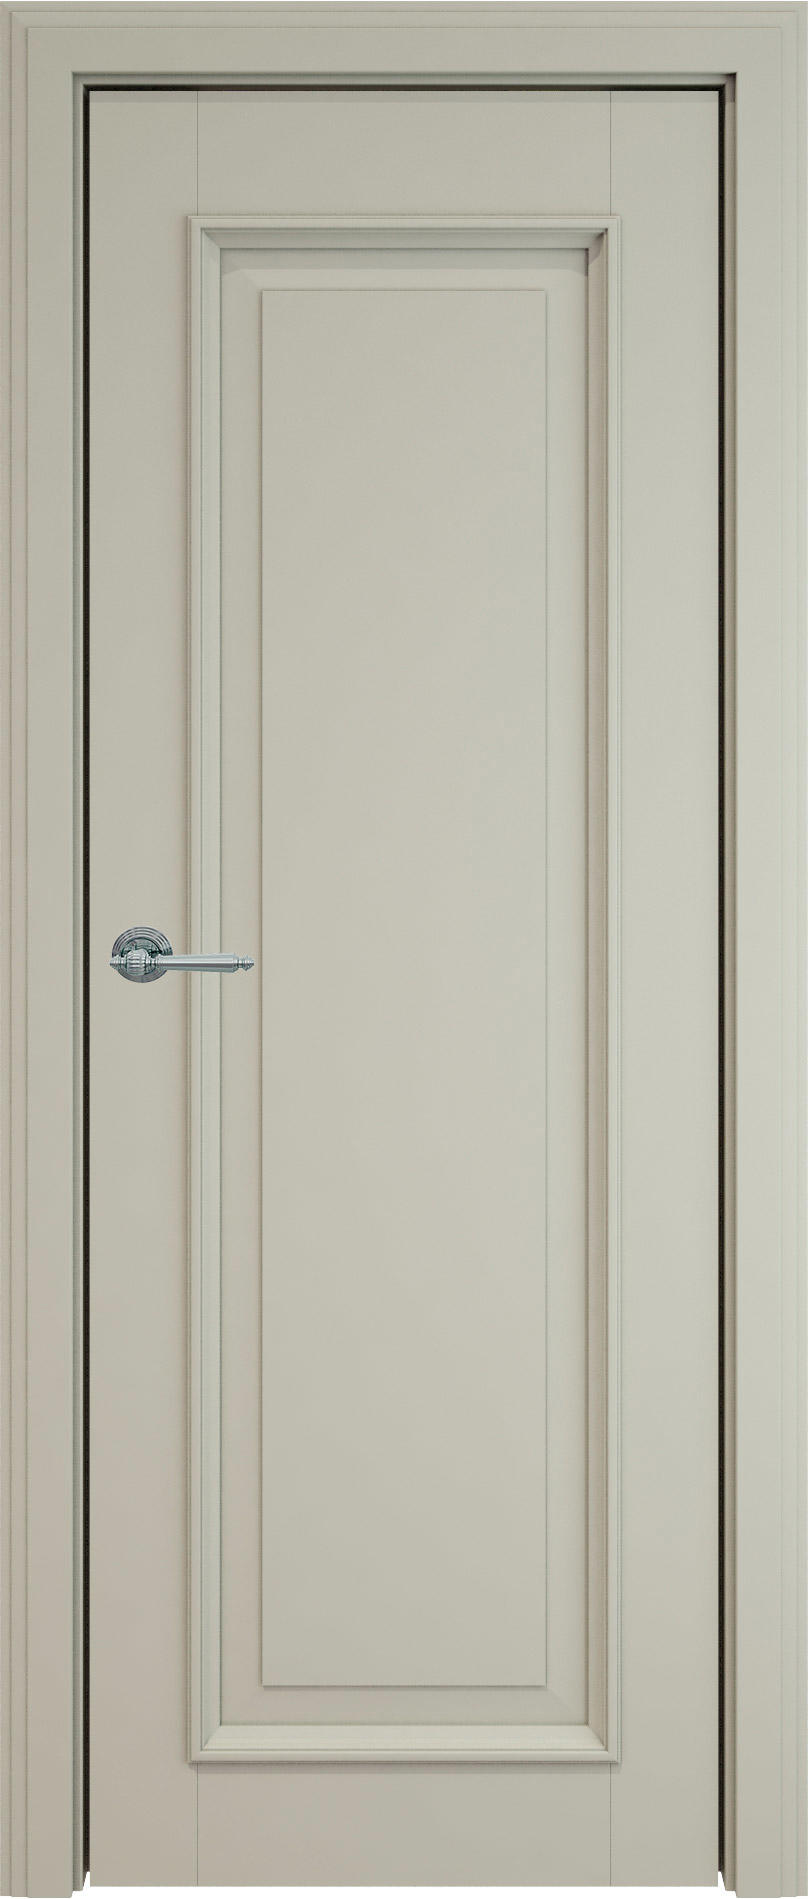 Domenica LUX цвет - Серо-оливковая эмаль (RAL 7032) Без стекла (ДГ)